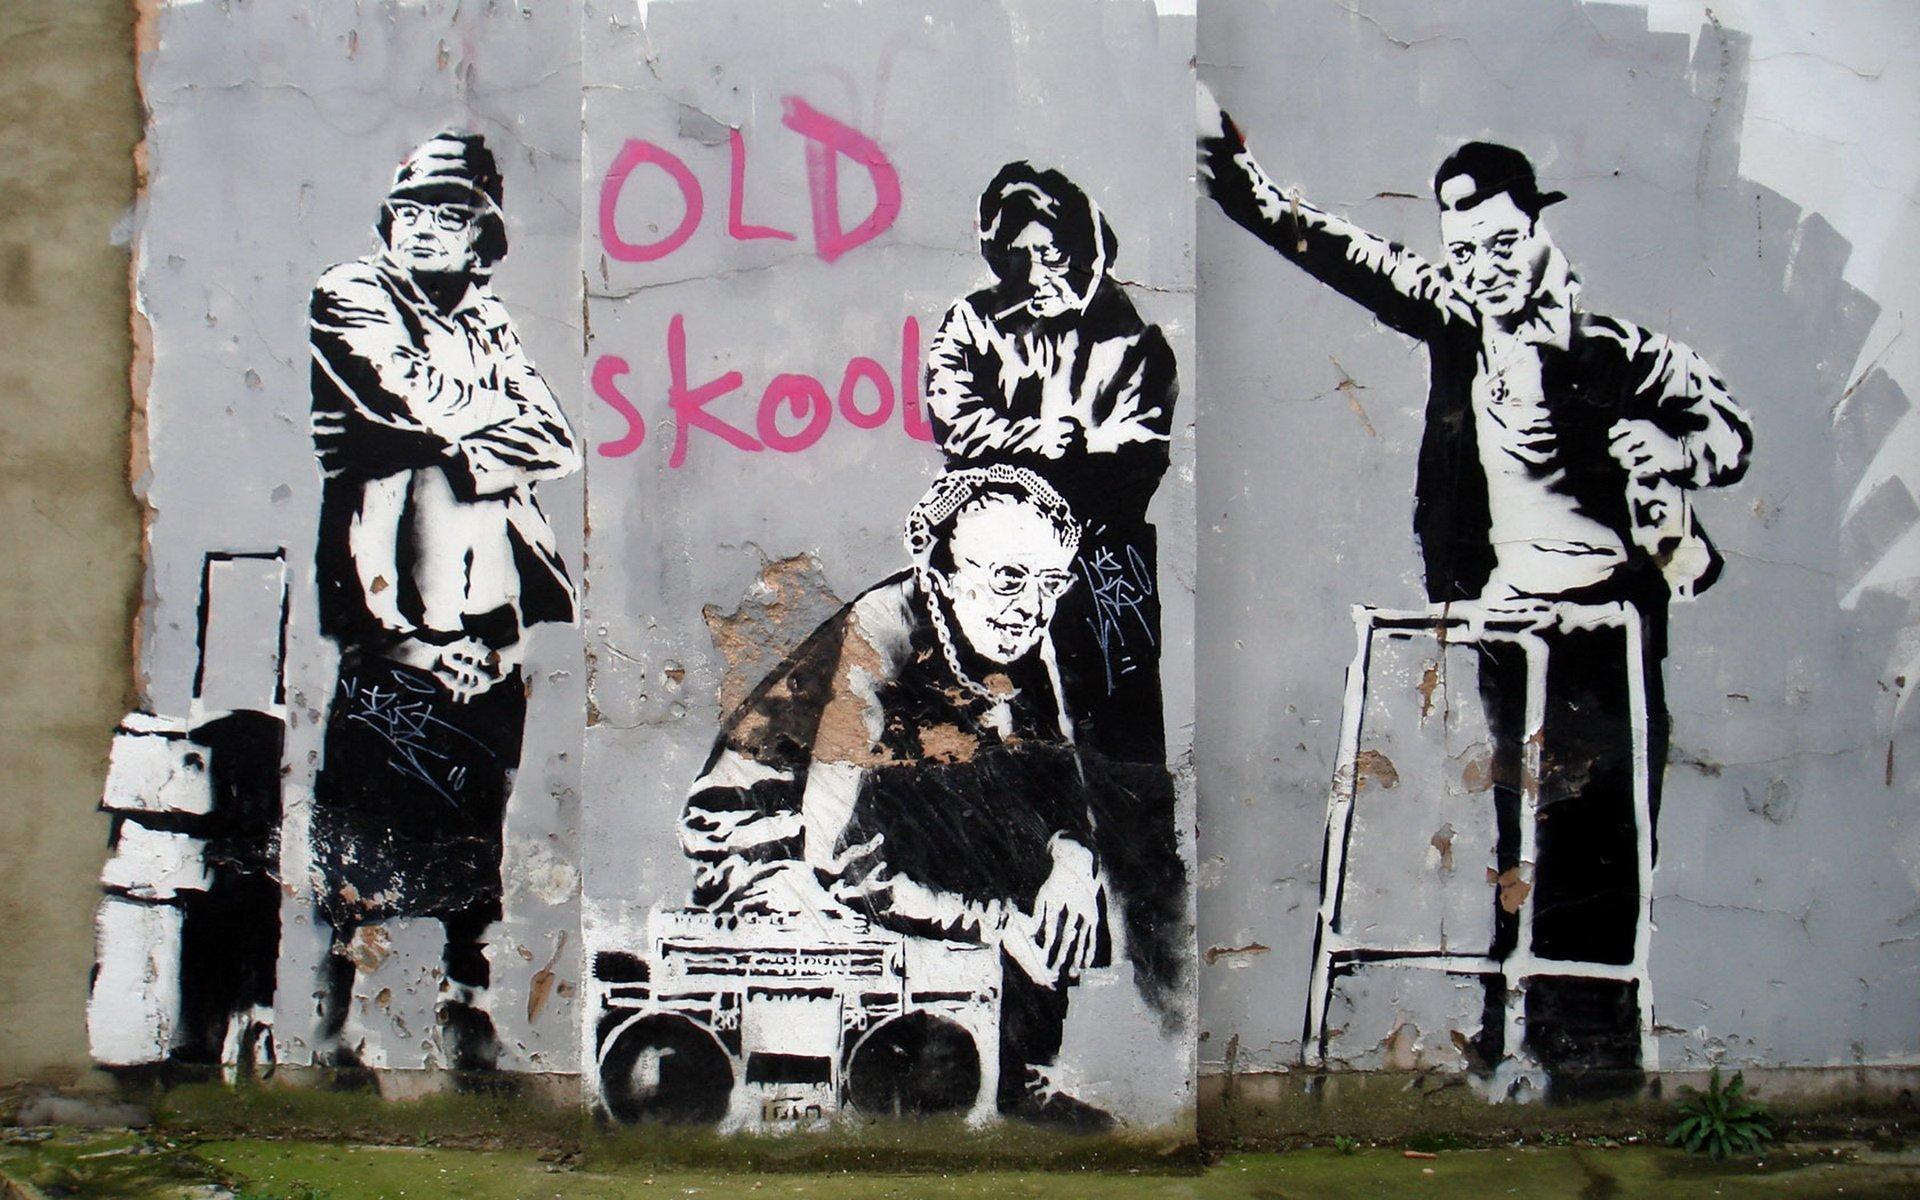 wallpaper.wiki-Download-Banksy-Art-Image-PIC-WPC004548